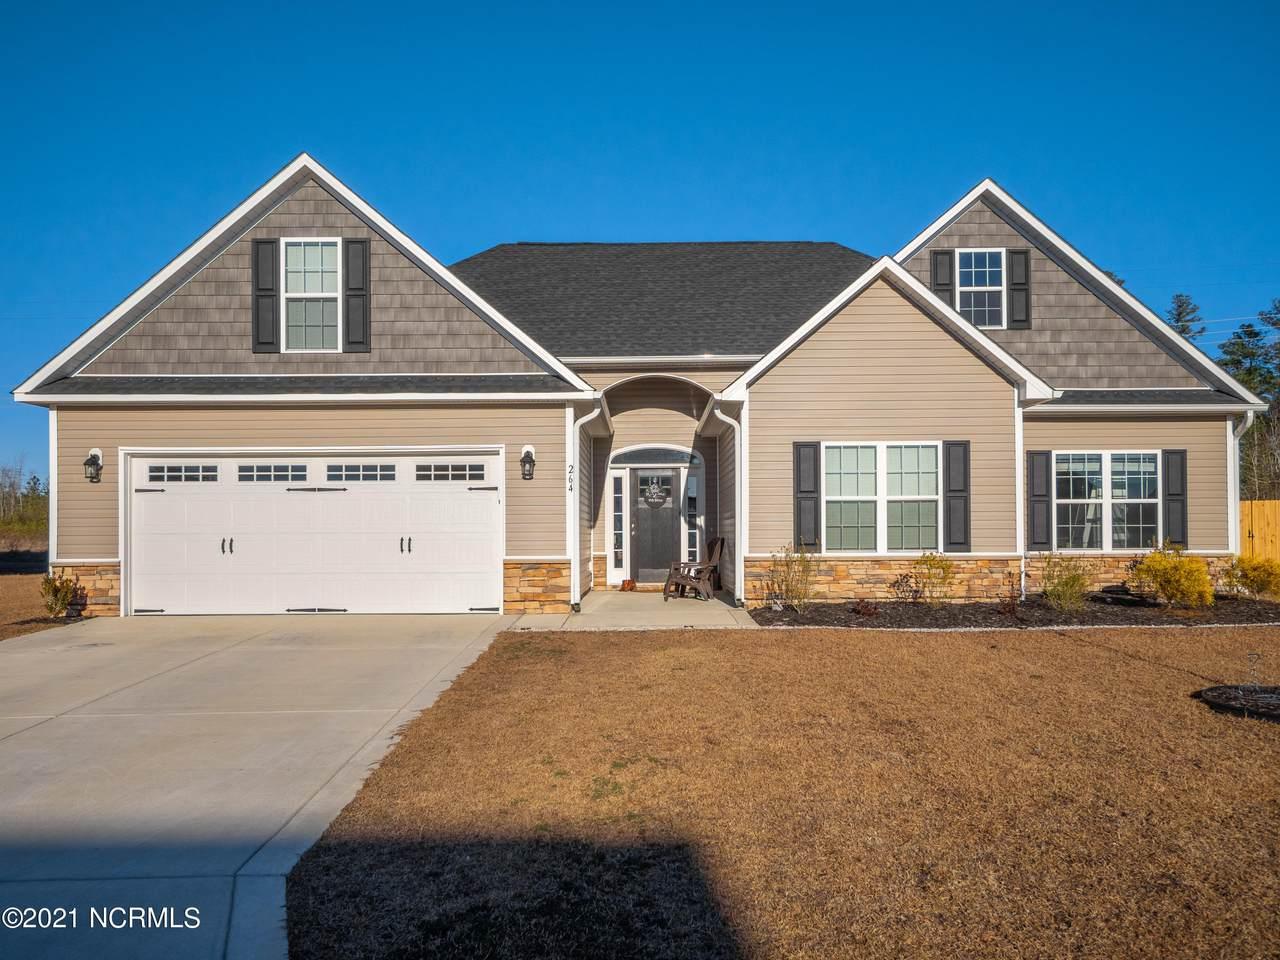 264 Wood House Drive - Photo 1